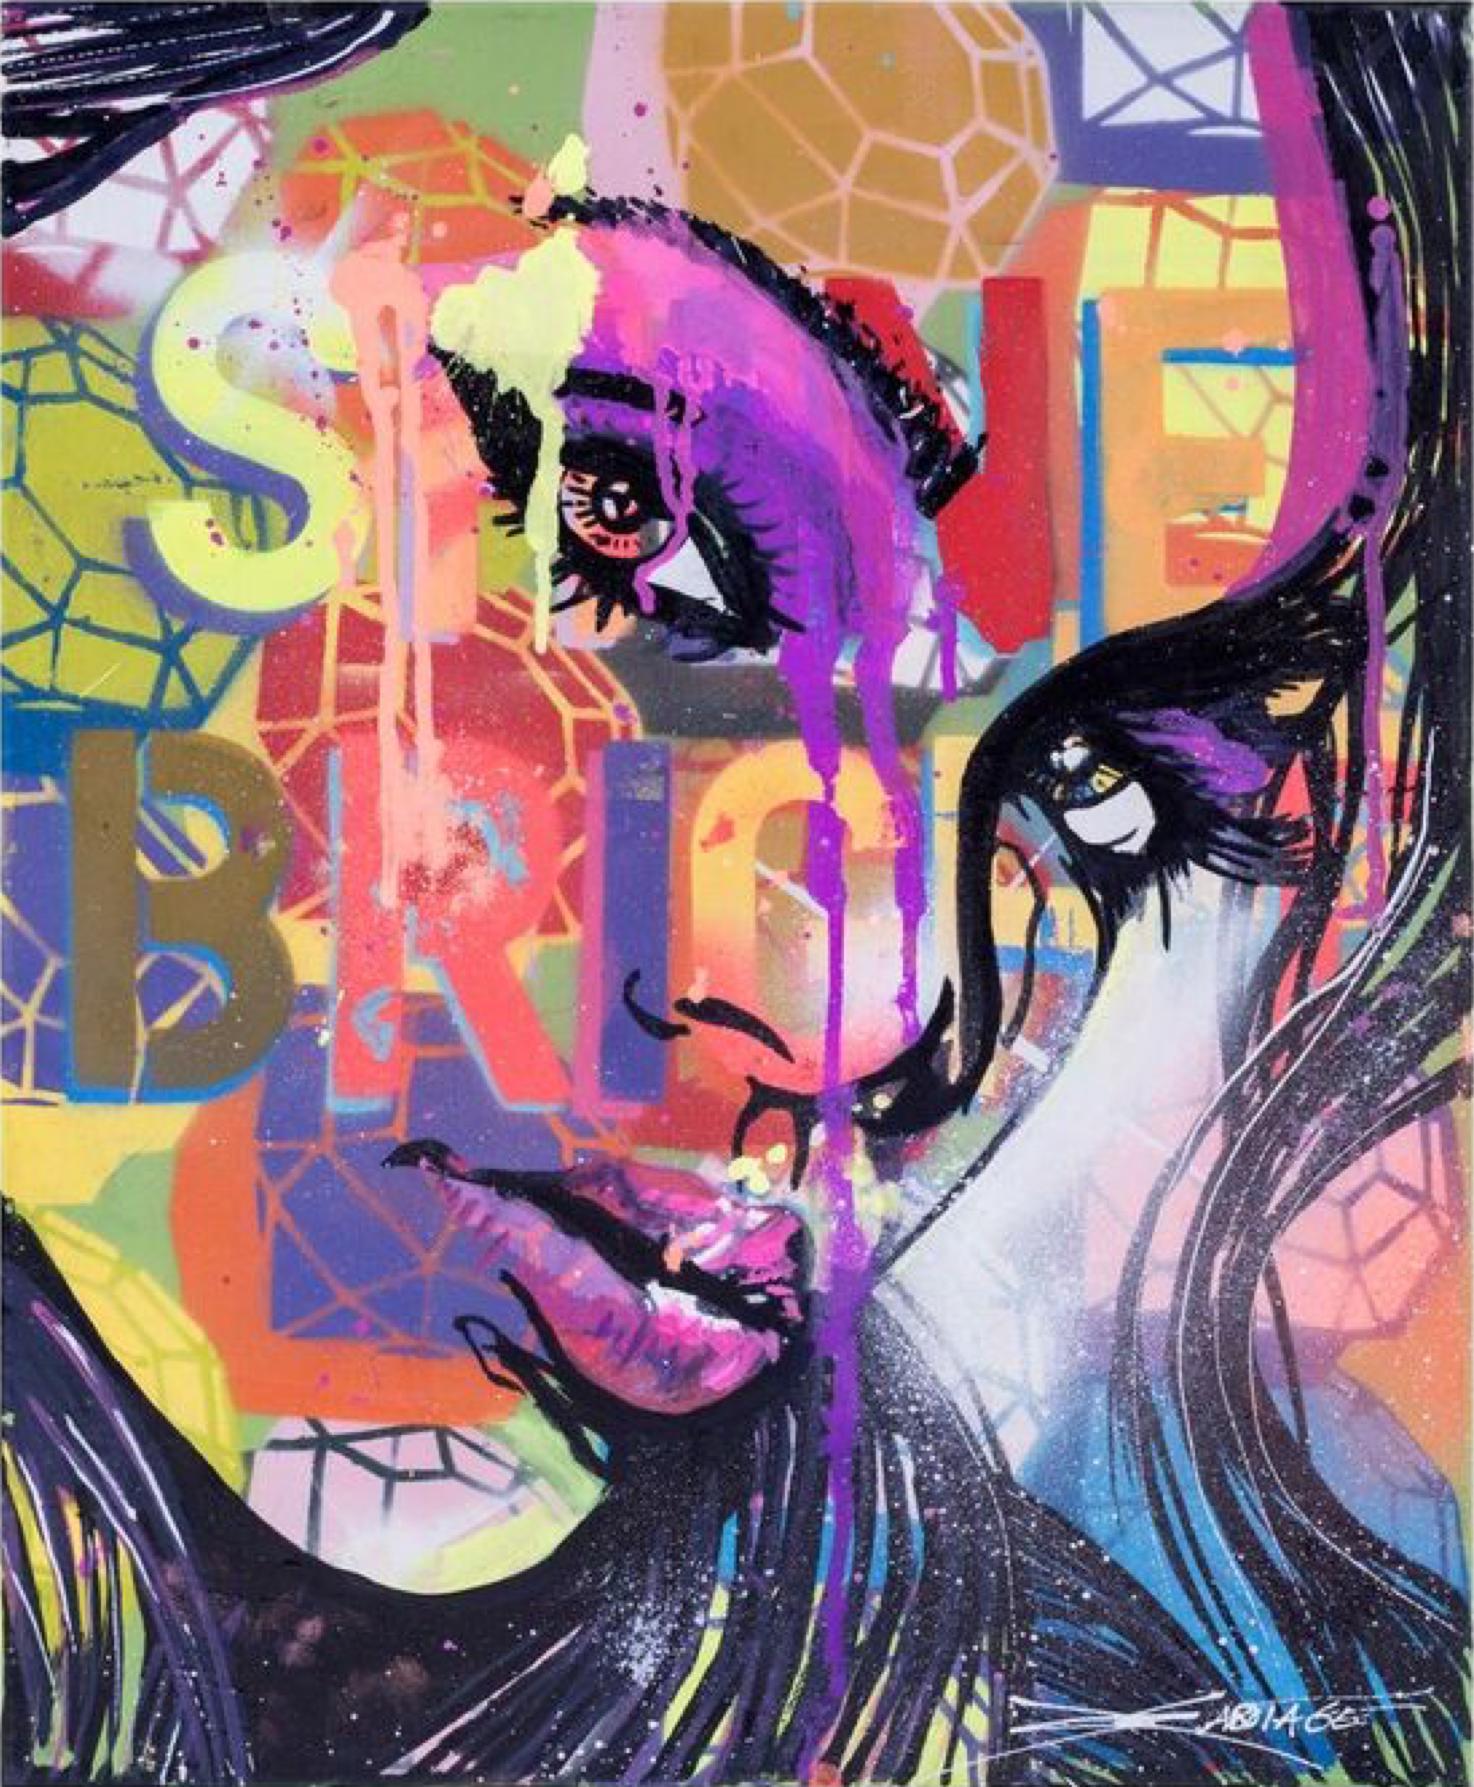 """Shine Bright""  pray Paint, Stencil, Graffiti Markers 40 x 51 cm 2017"